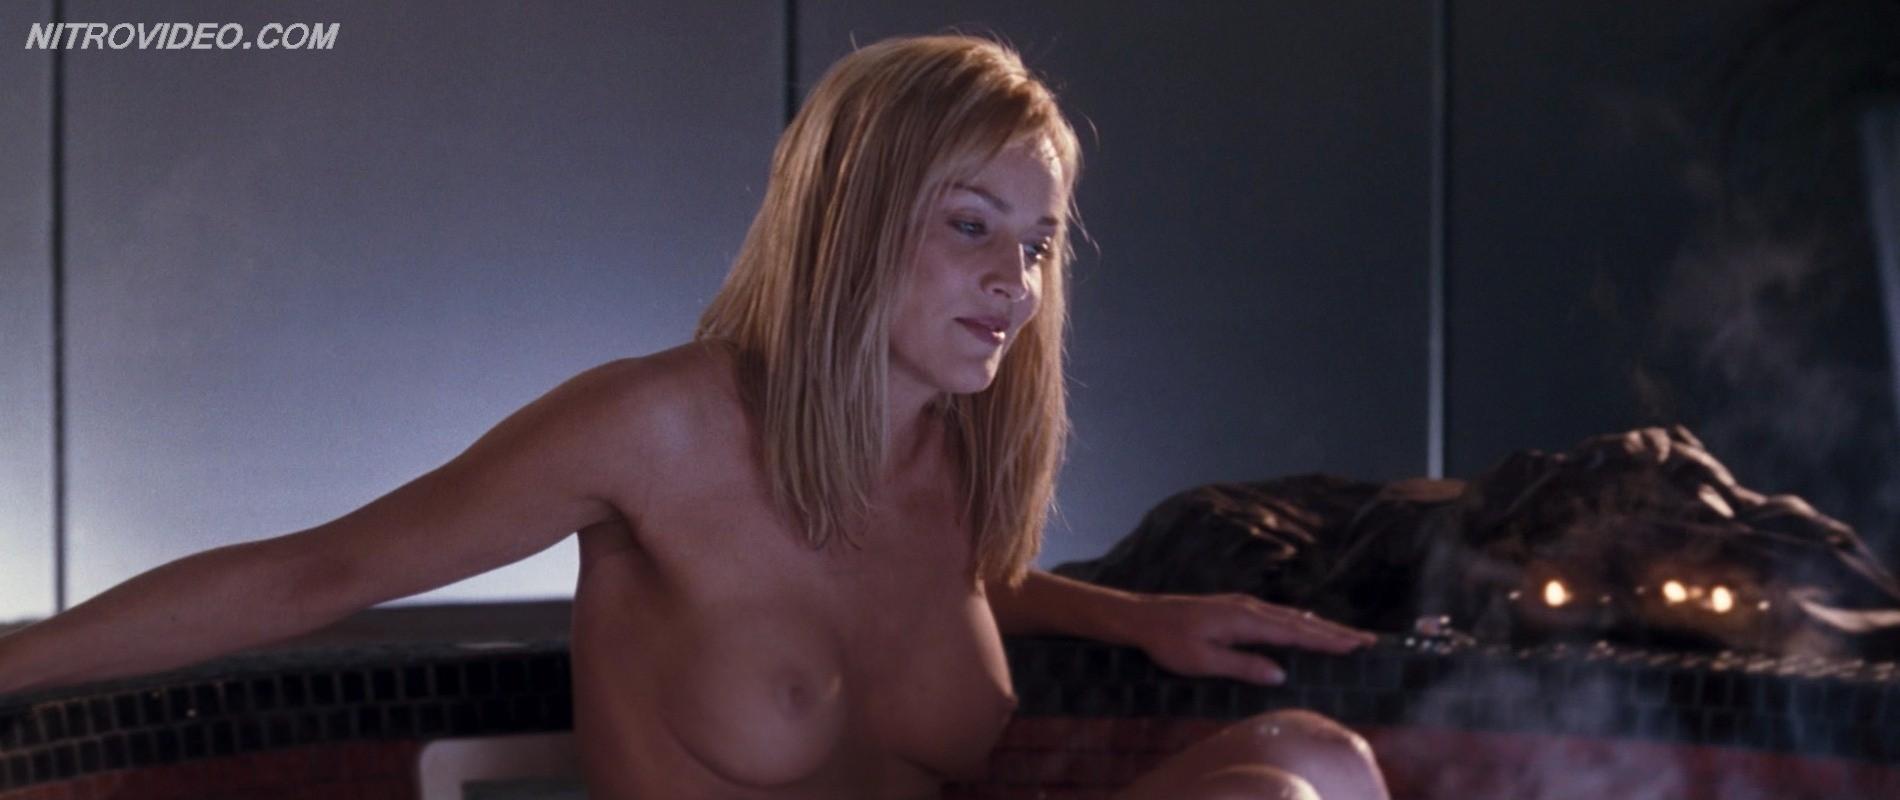 Miranda cosgrove young nudes